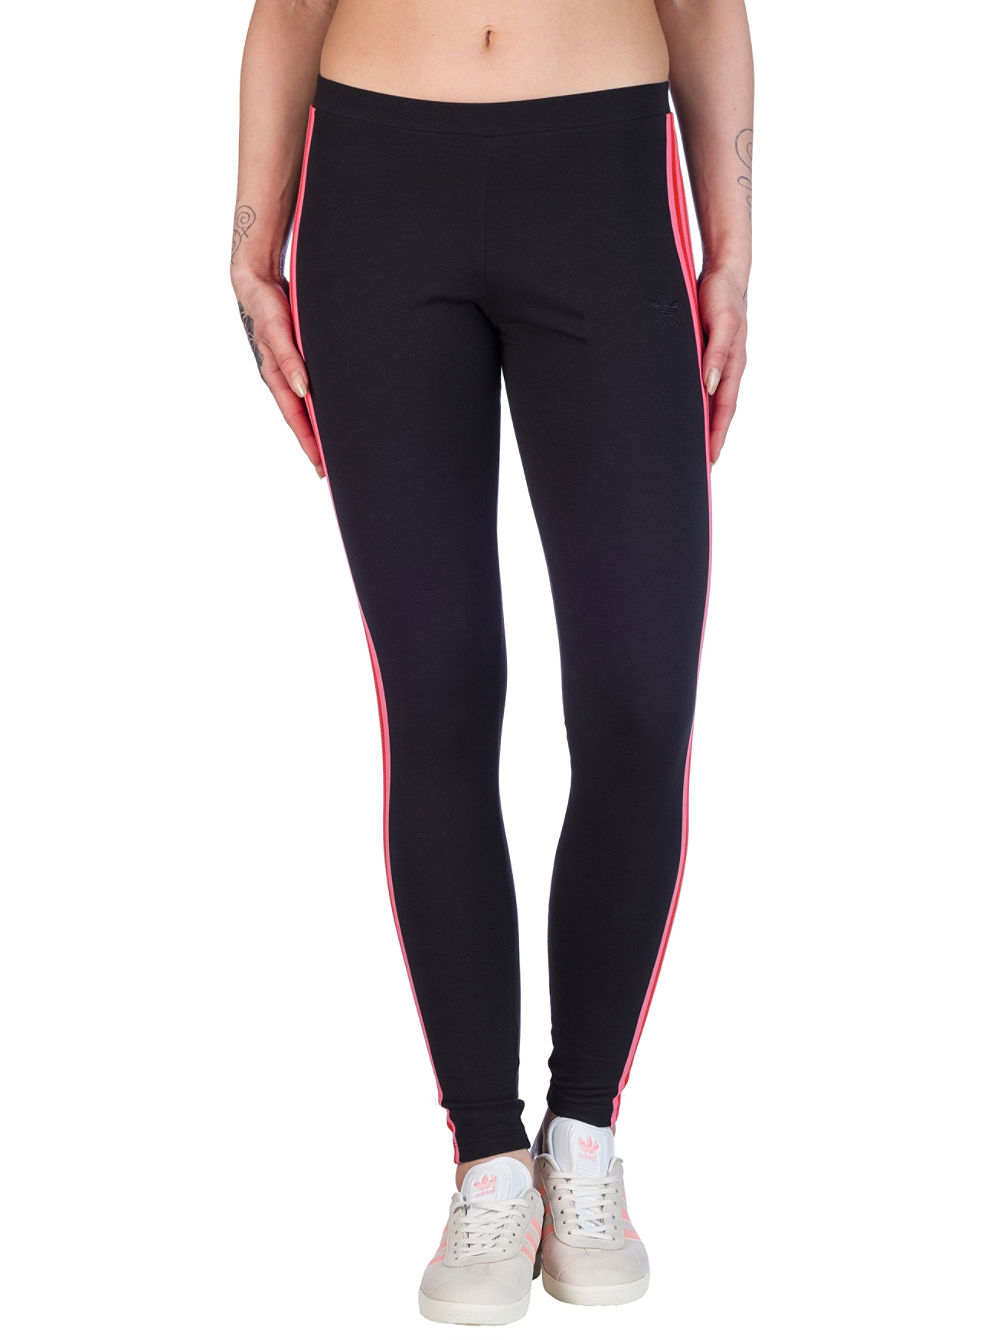 88675cf5a9f Buy adidas Originals Clrdo Mesh Leggings online at Blue Tomato